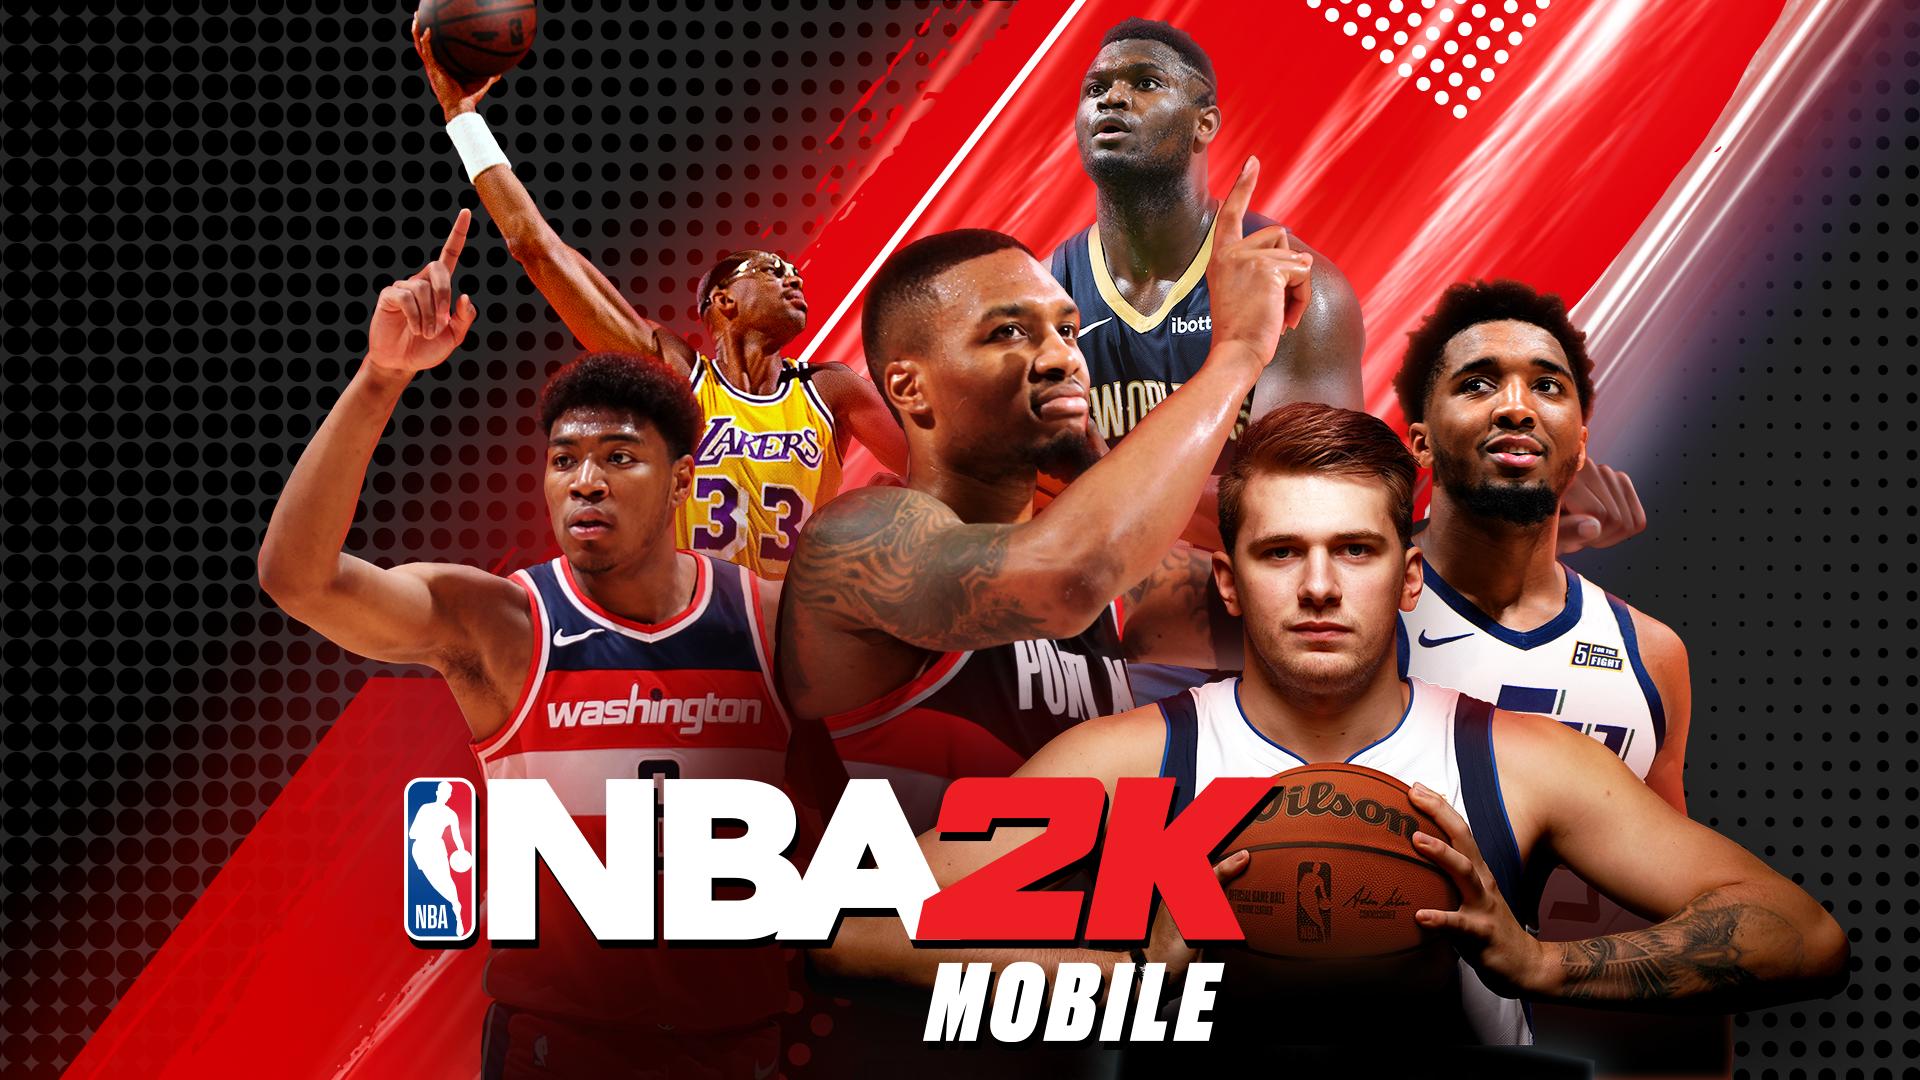 nba 2k mobile update